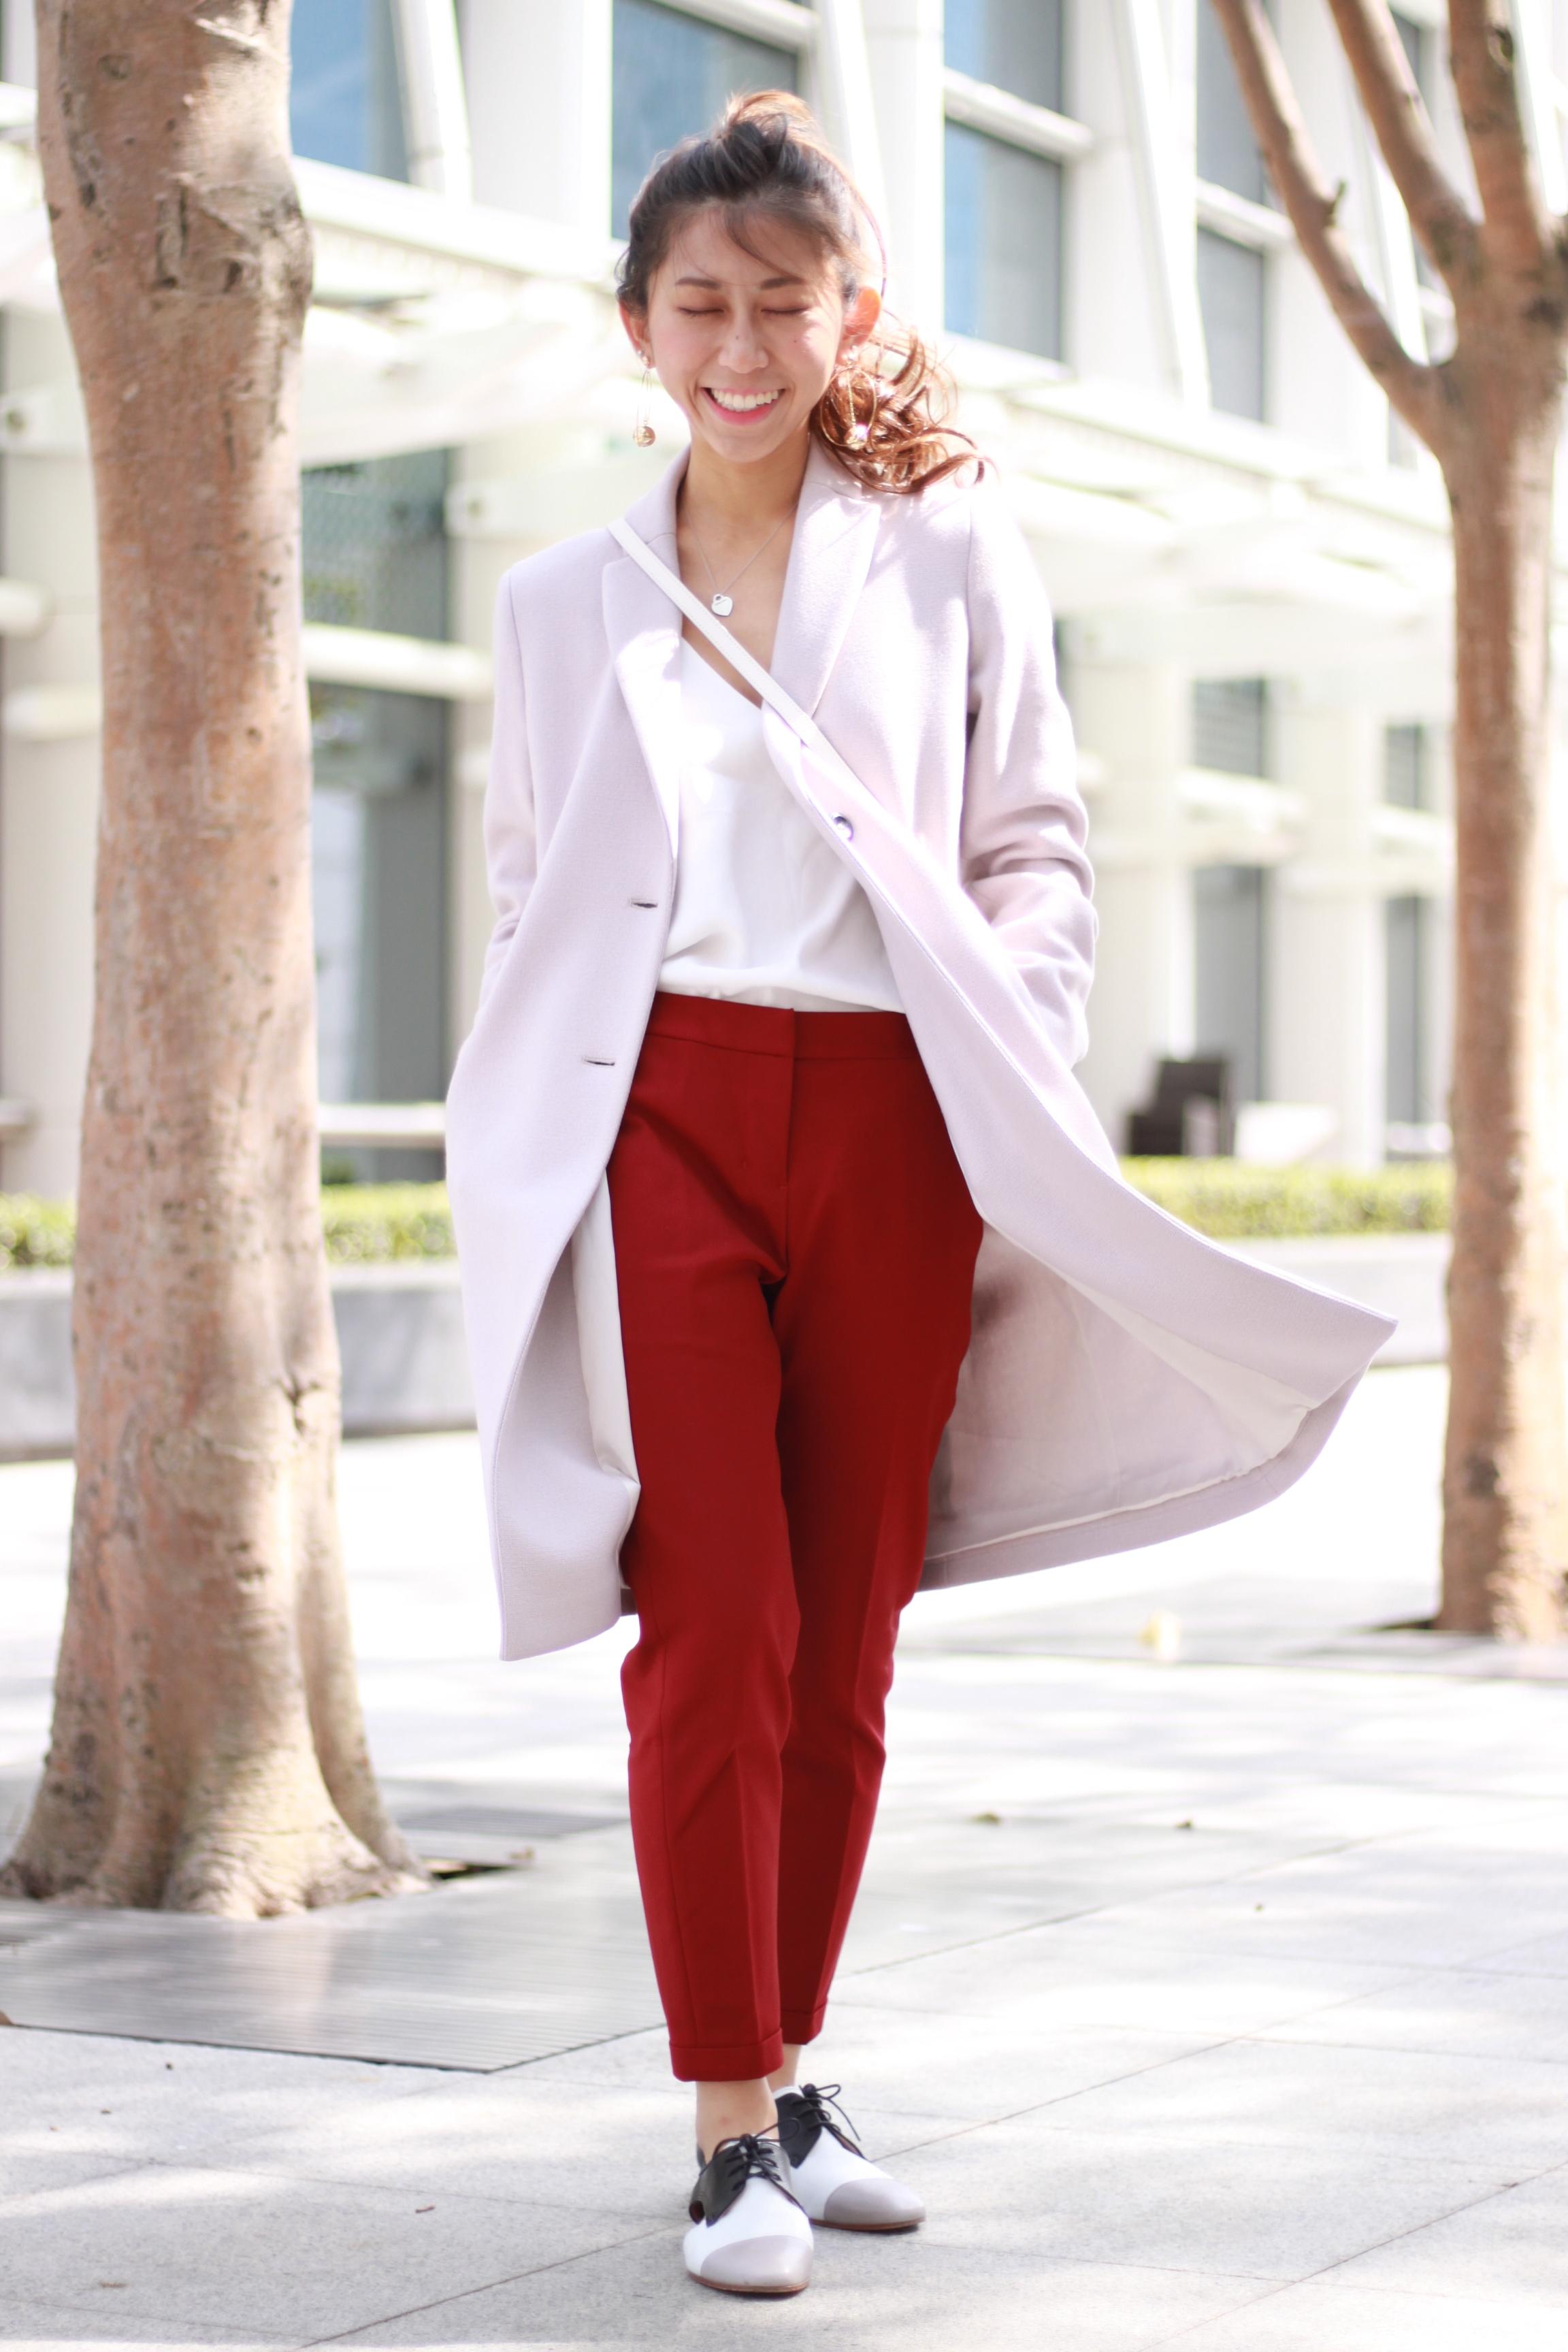 Asos white cami / Giordano Ladies red pants / Giordano Ladies cut-out oxford shoes / Pennyblack coat / Agnes b. white crossbag / DearPostman golden disco ball earrings